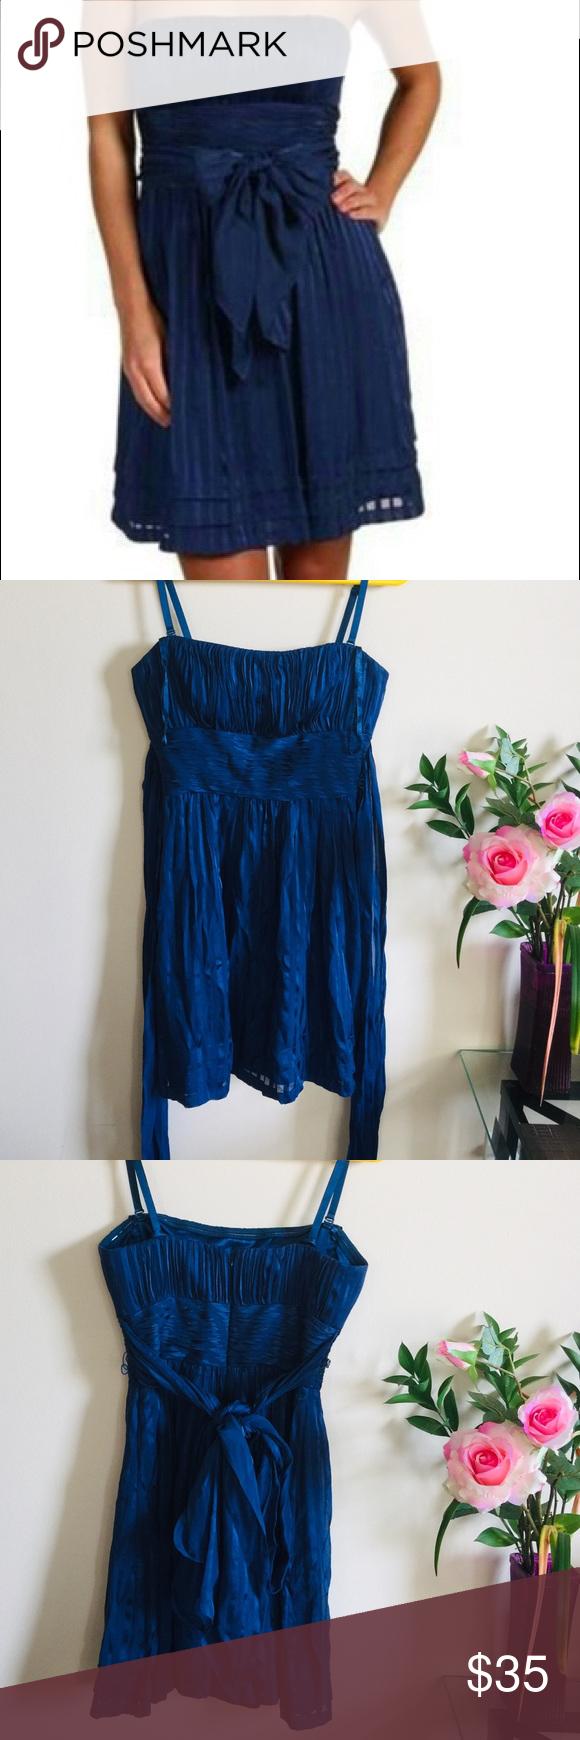 BCBGMAXAZRIA DRESS!! Size-04 Excellent condition!! Navy blue silk short dress! BCBGMaxAzria Dresses Mini #navyblueshortdress